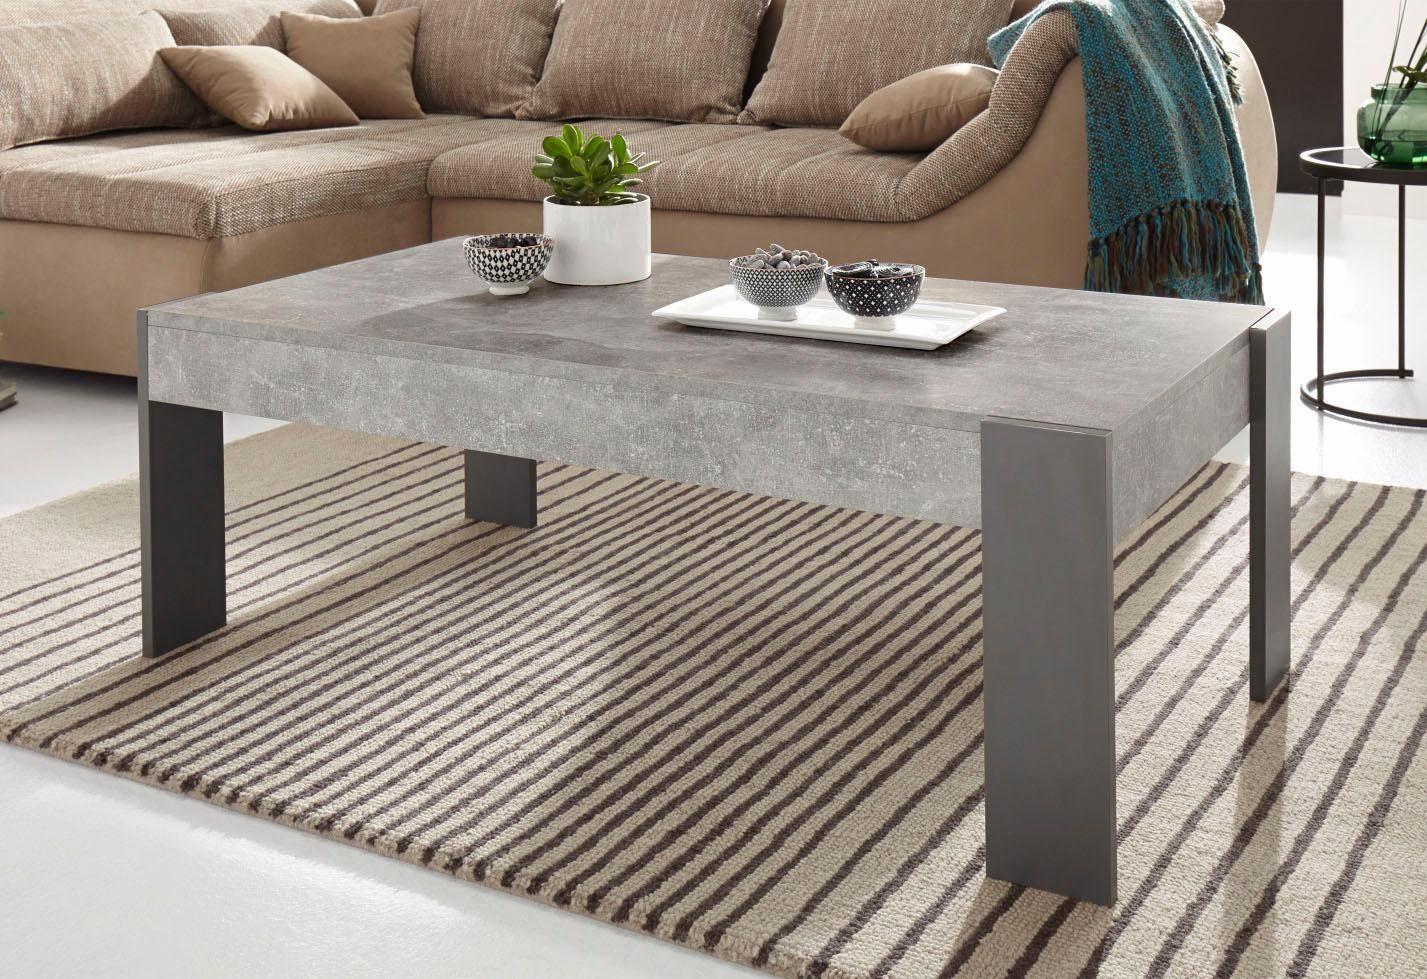 Salontafel Van Beton : Salontafel in moderne beton look makkelijk gekocht otto